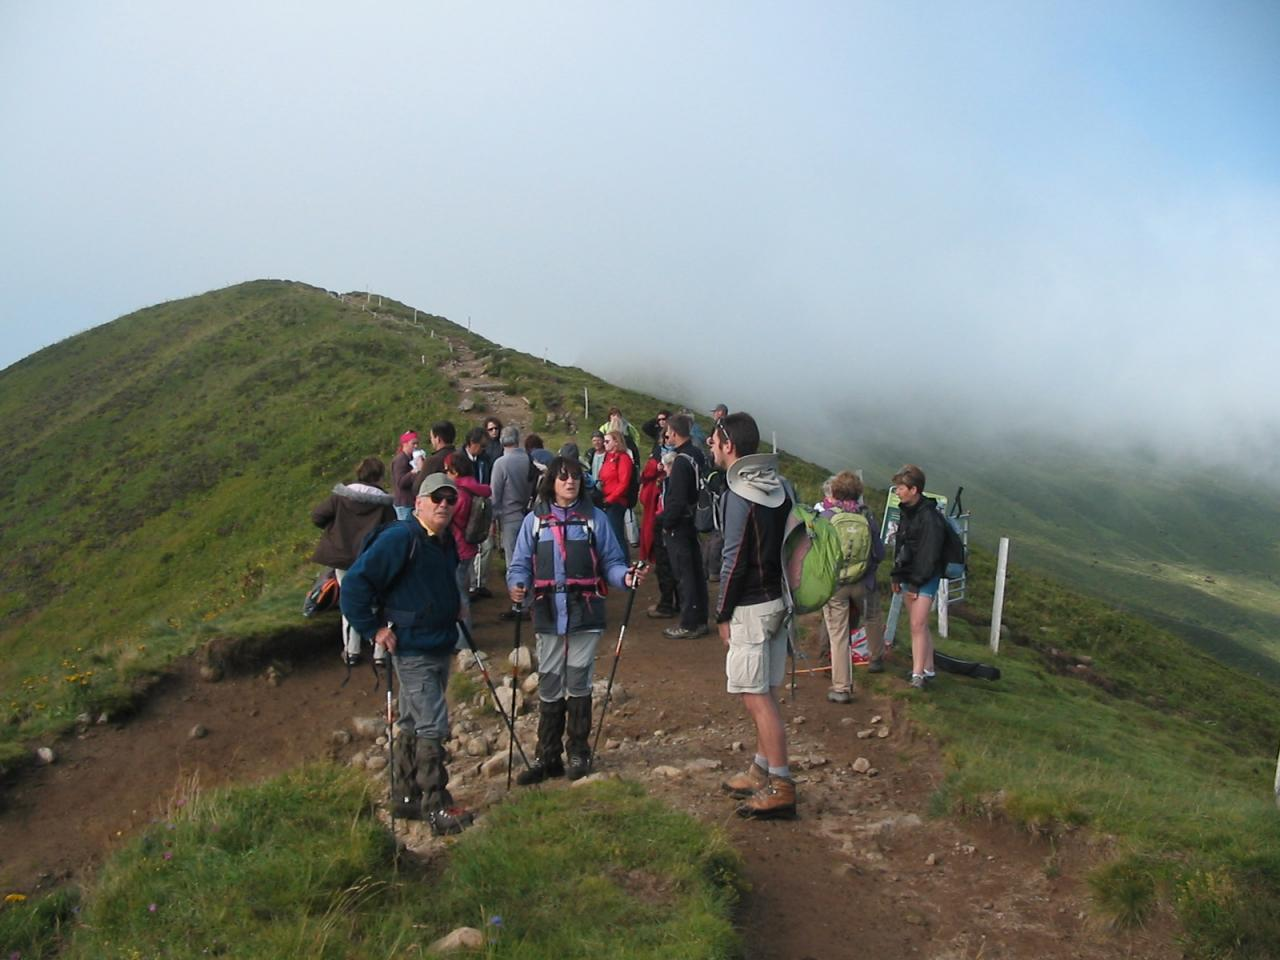 Grande randonnée du jeudi: vers Chavaroche